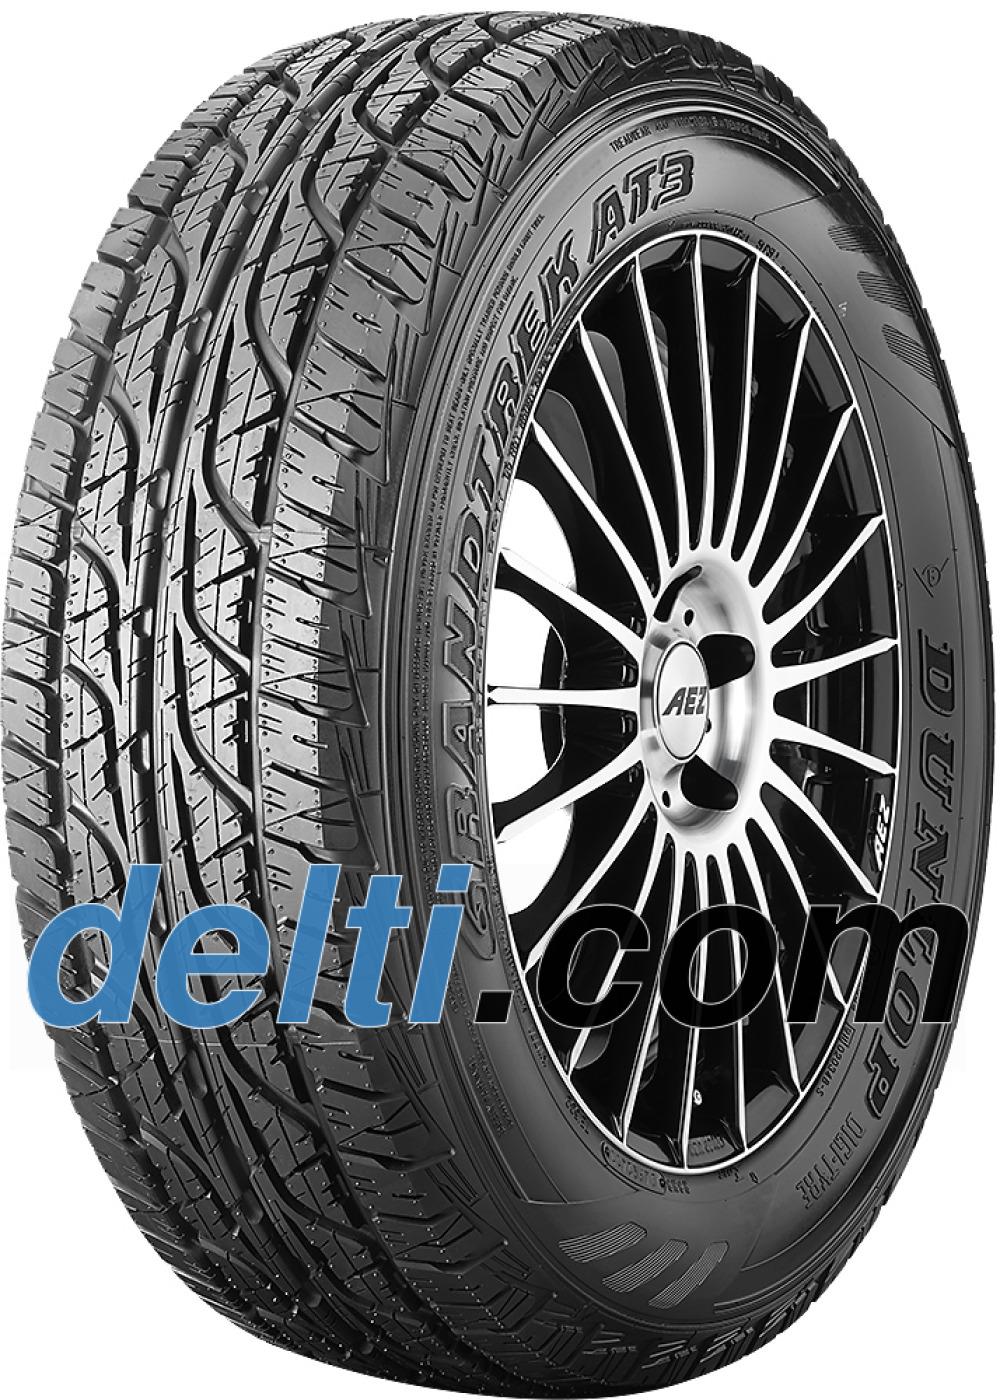 Dunlop Grandtrek AT 3 ( LT265/75 R16 112/109S OWL )